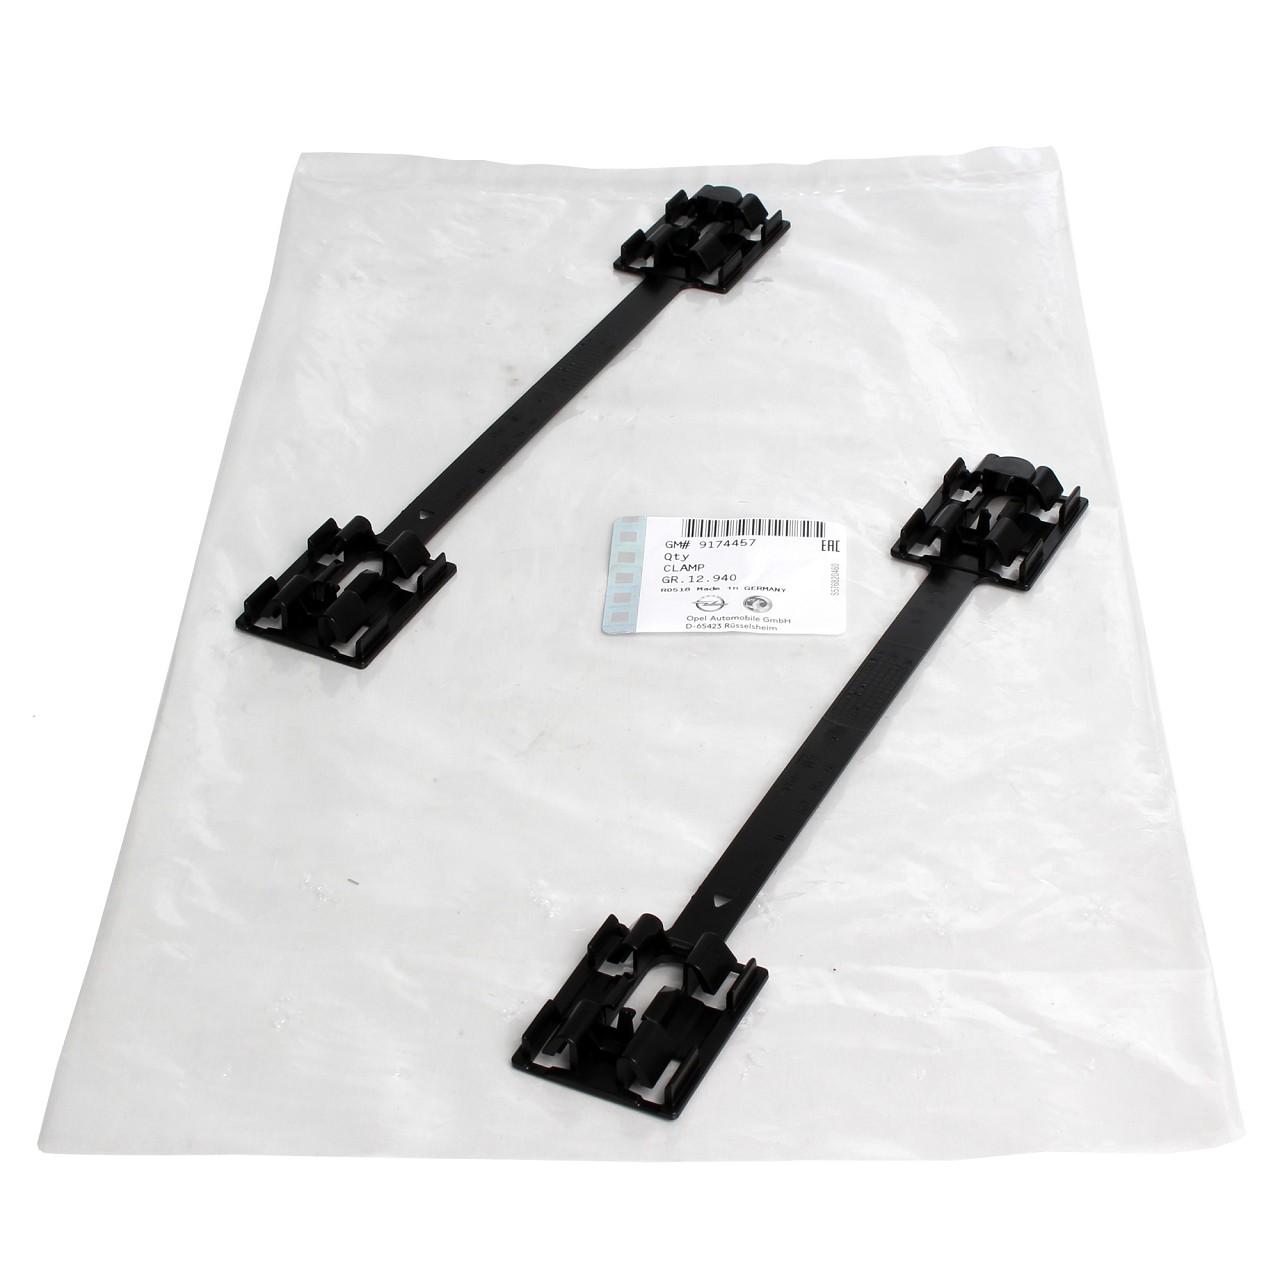 2x ORIGINAL Opel Clip Plastik Halter Klammer Verschluss Befestigung 9174457